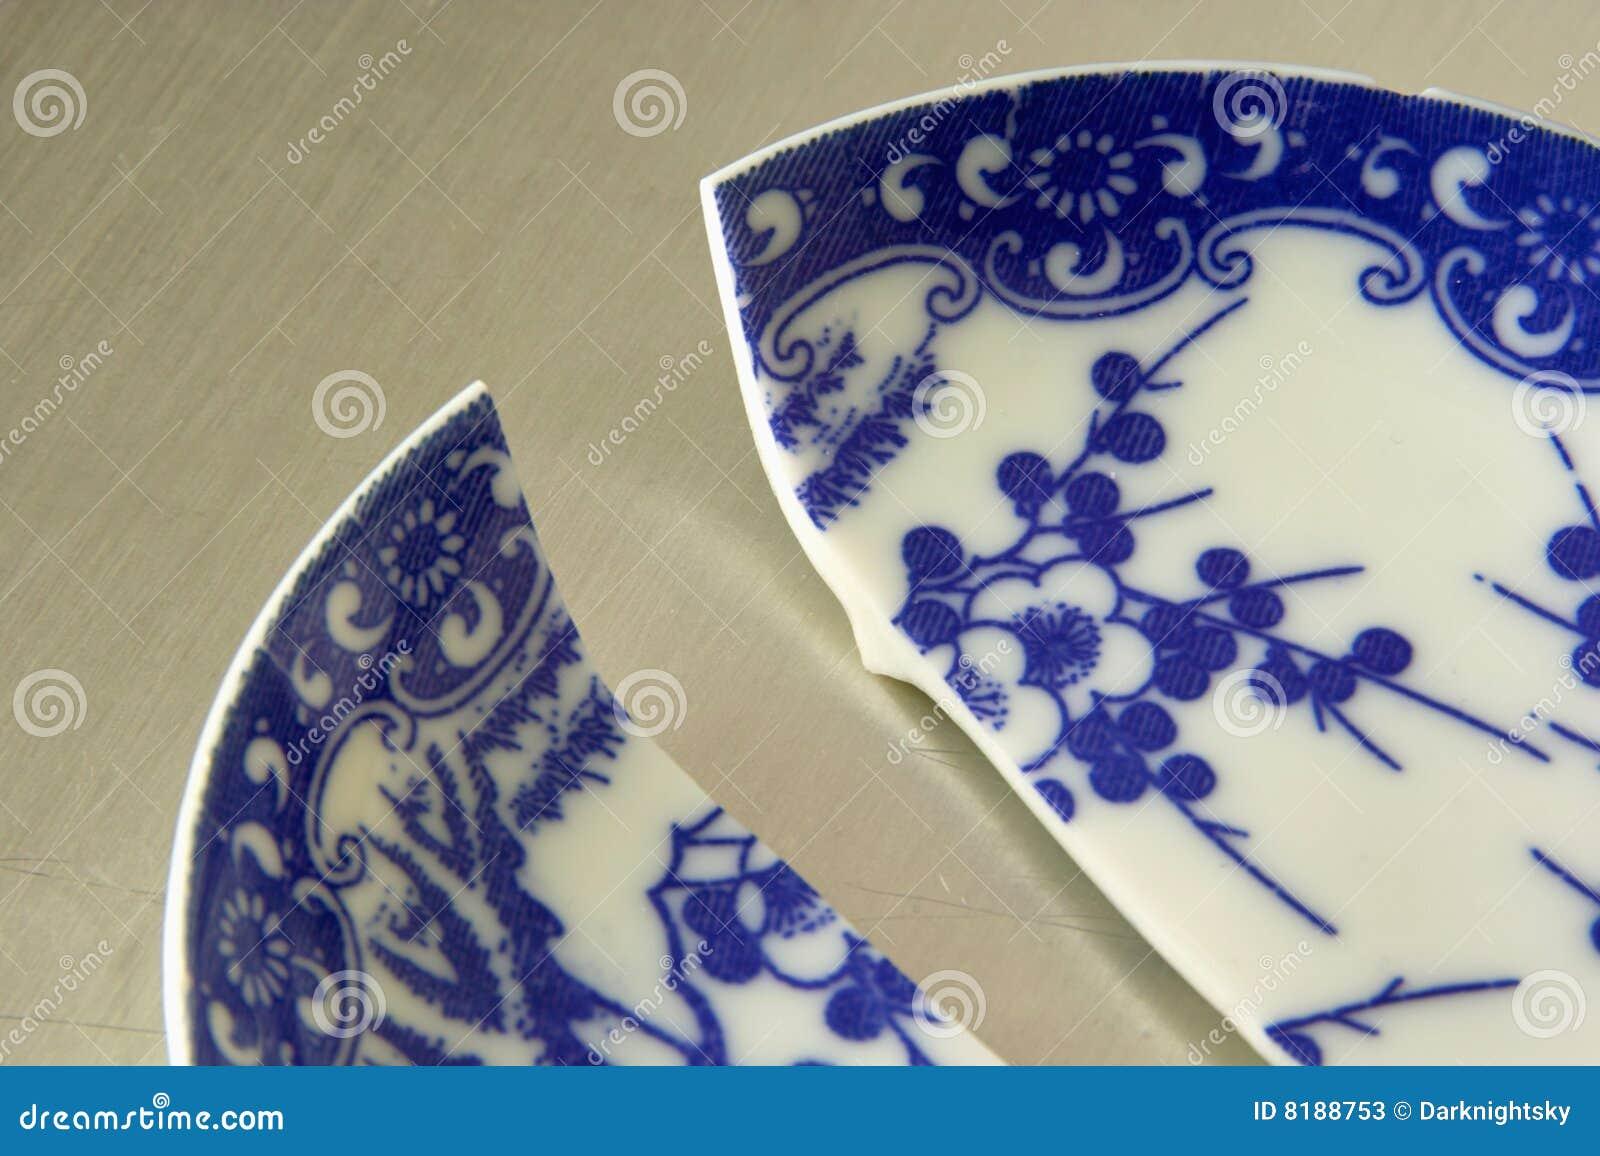 Broken China Stock Image Image Of Blue Hotel Half